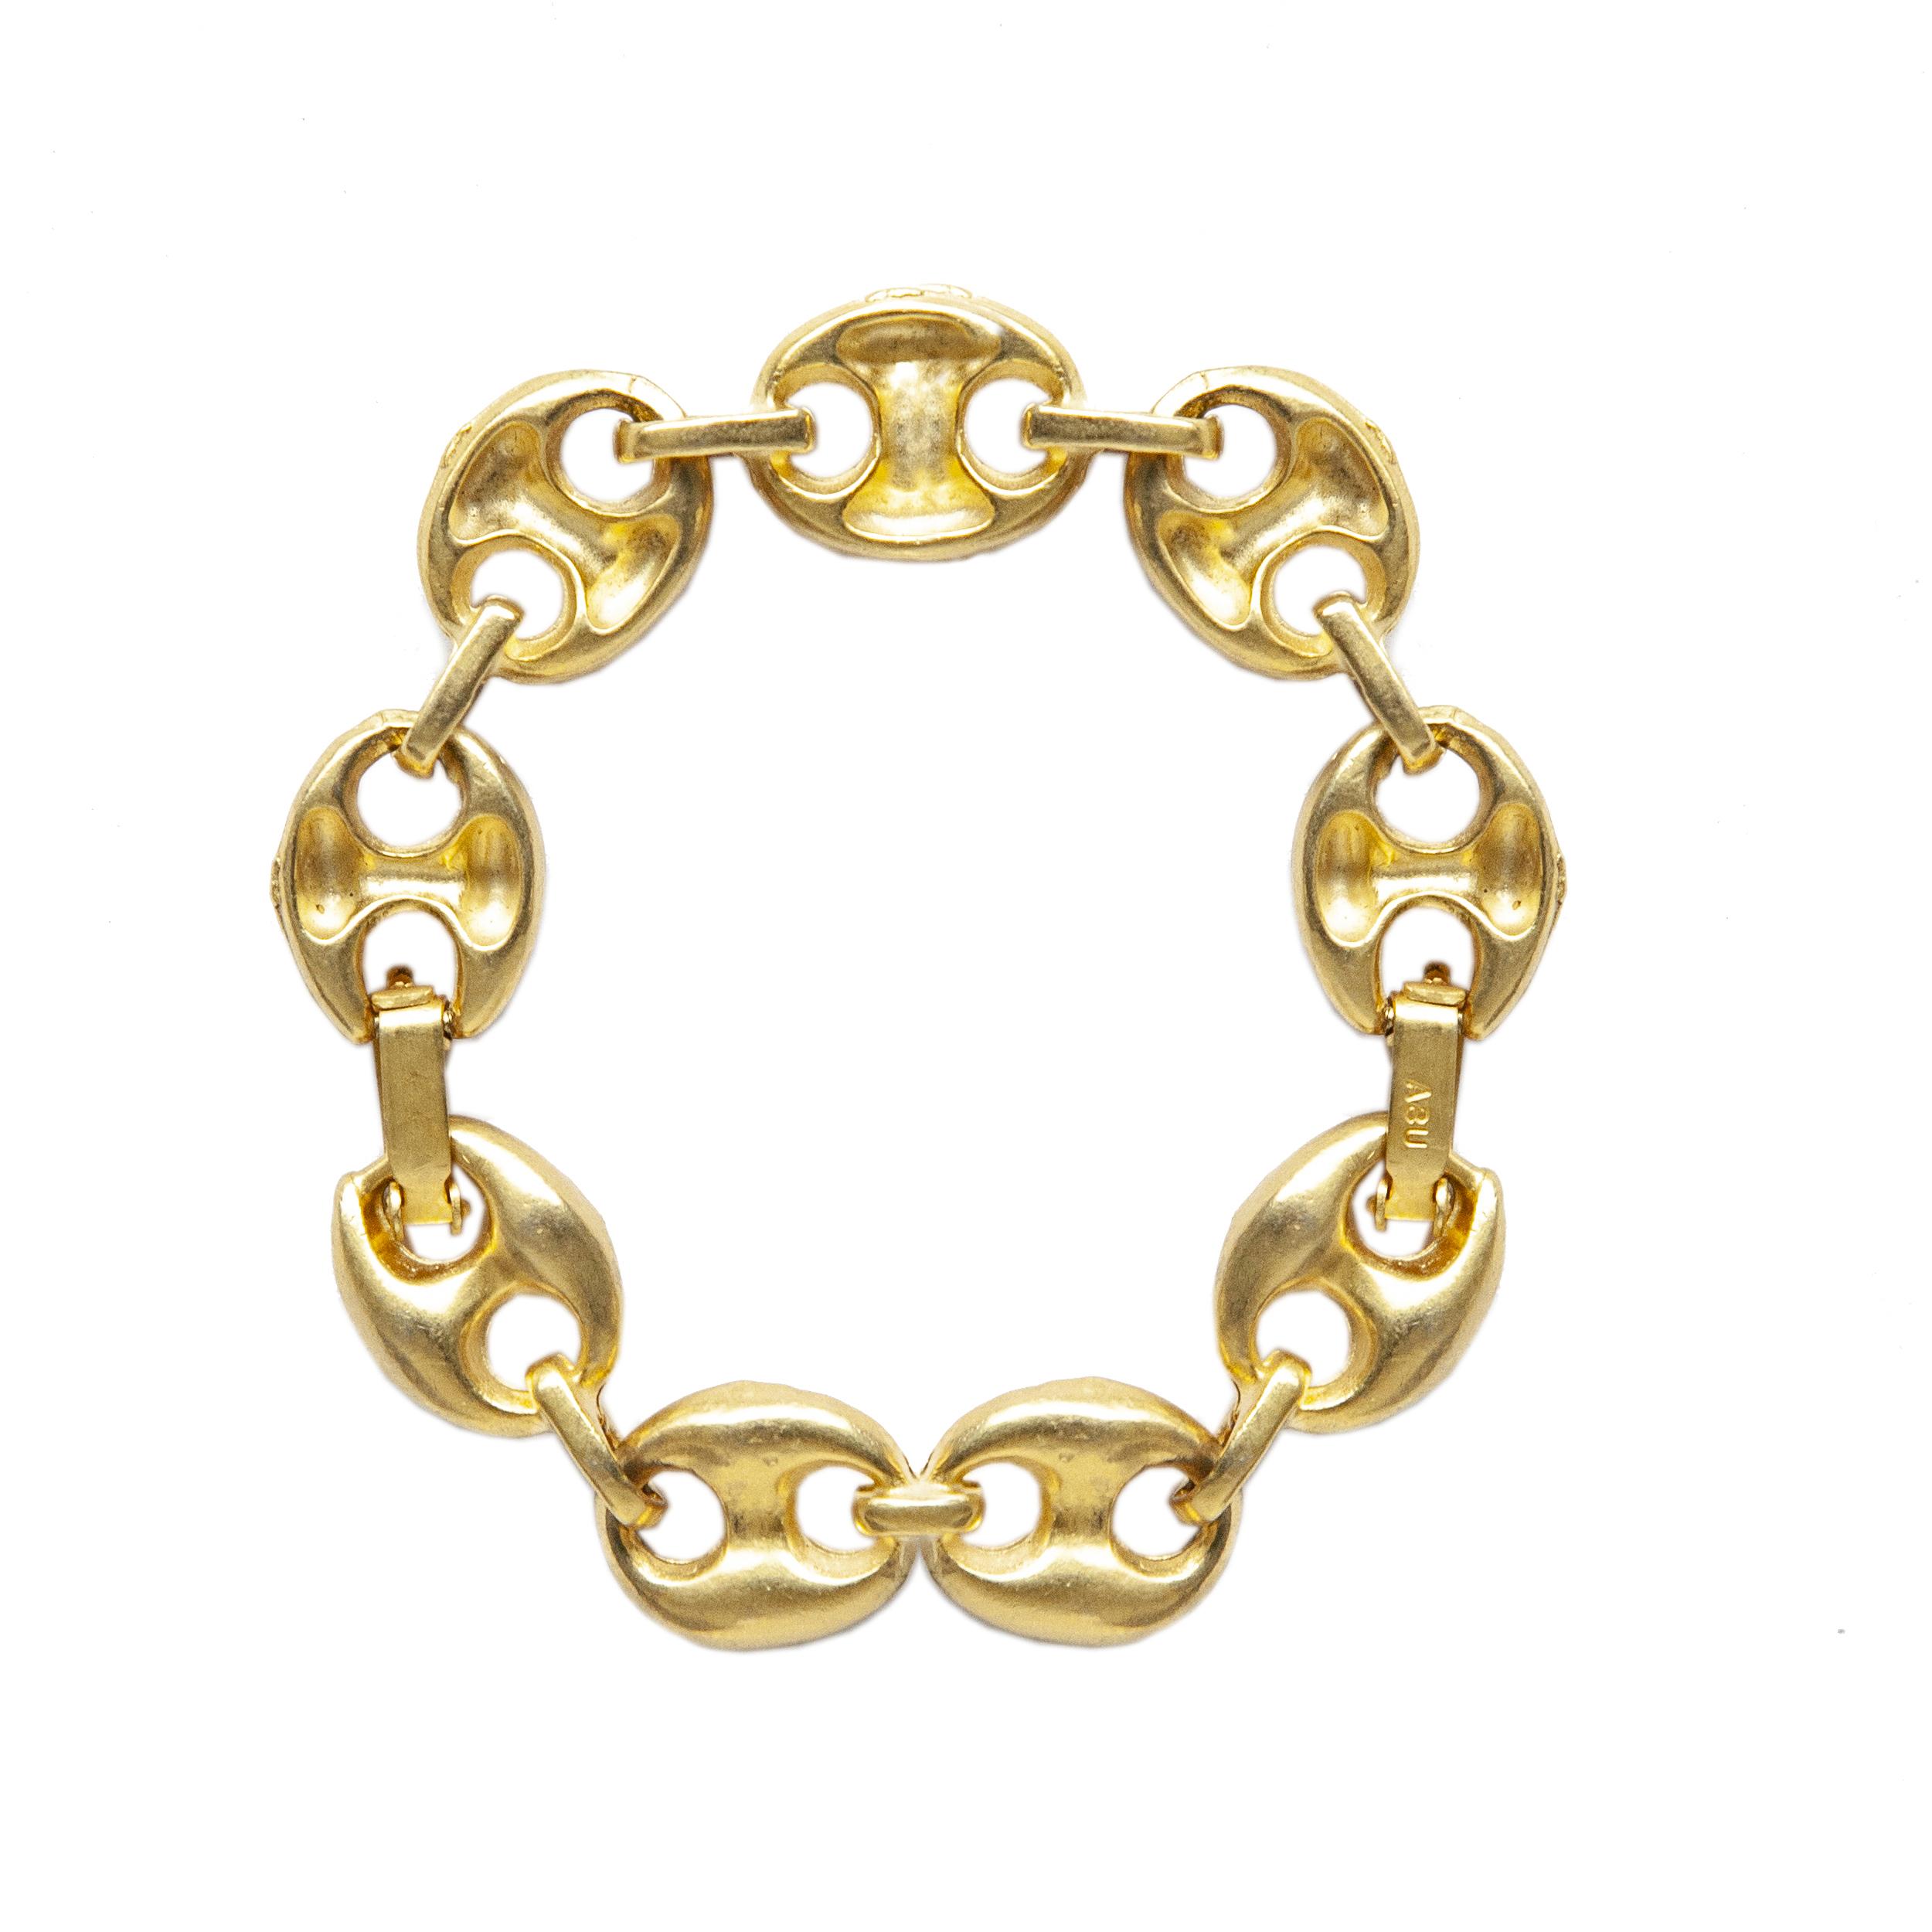 philia bracelet - $200.00 AUD